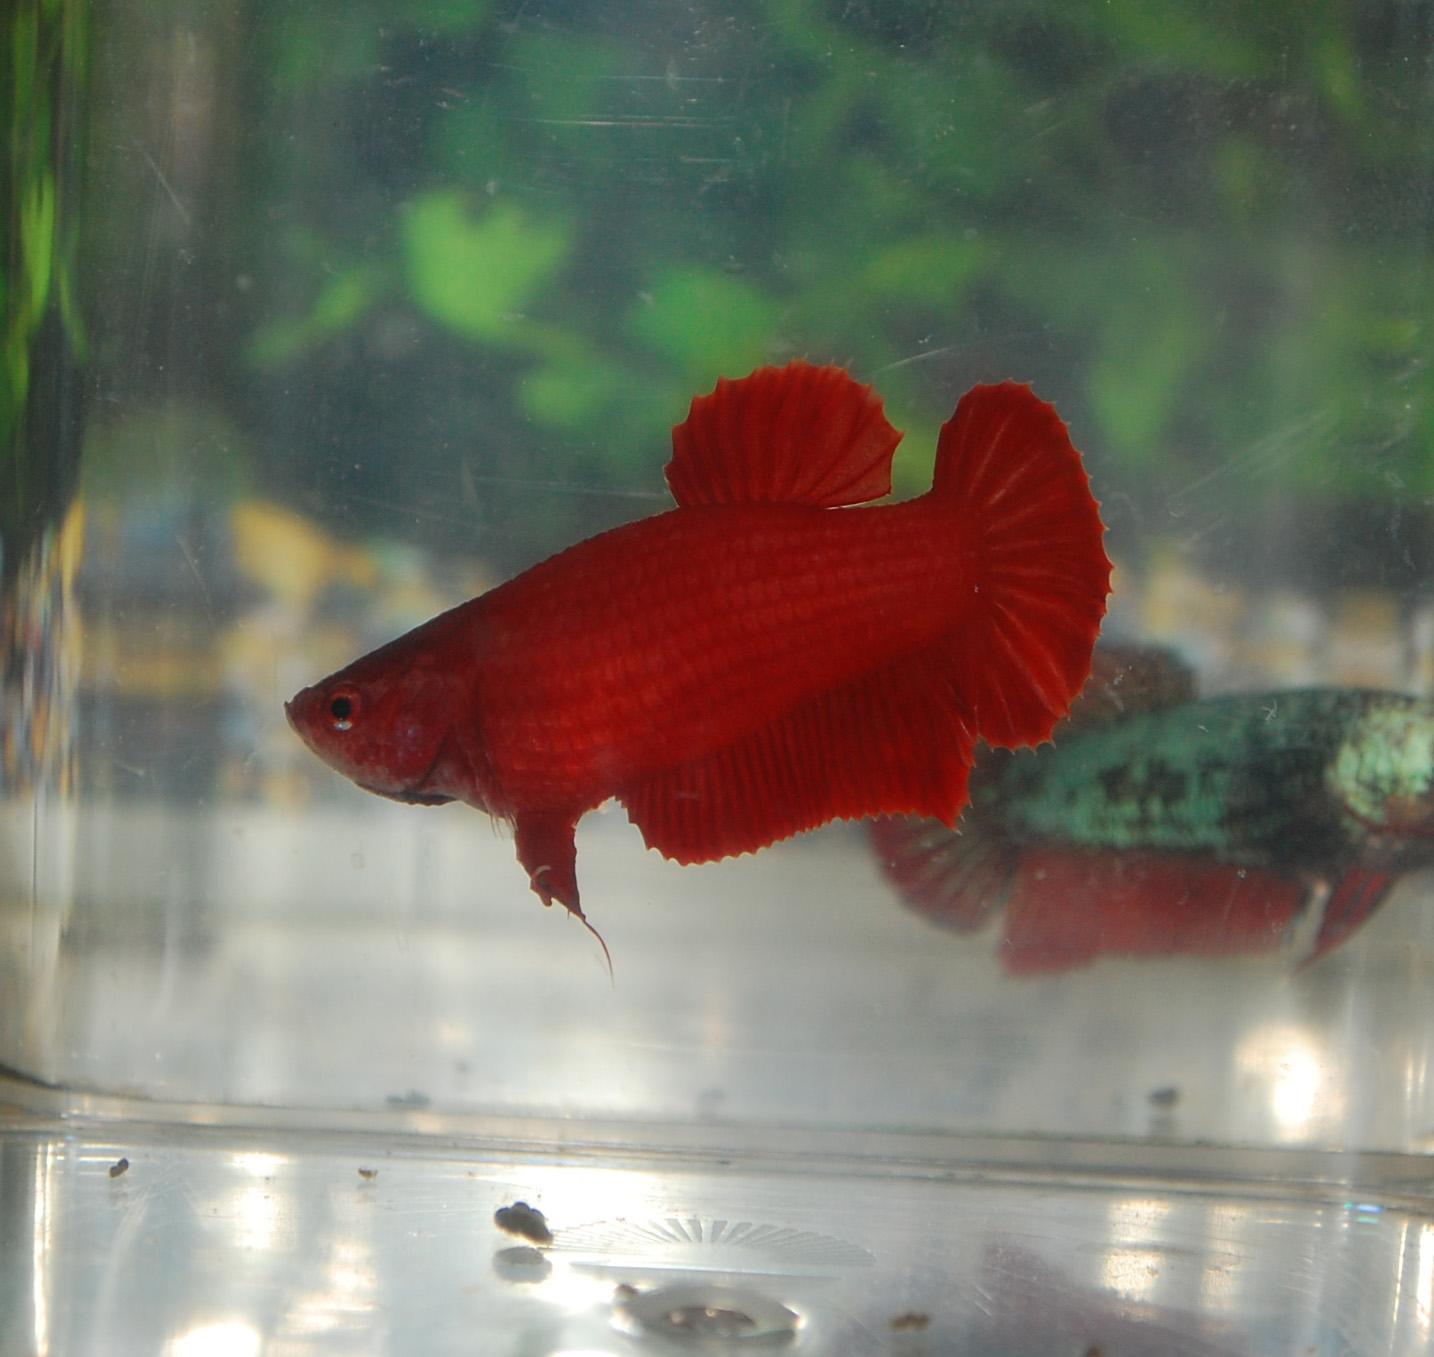 Betta fish afira betta hmpk super red sold out for Red betta fish